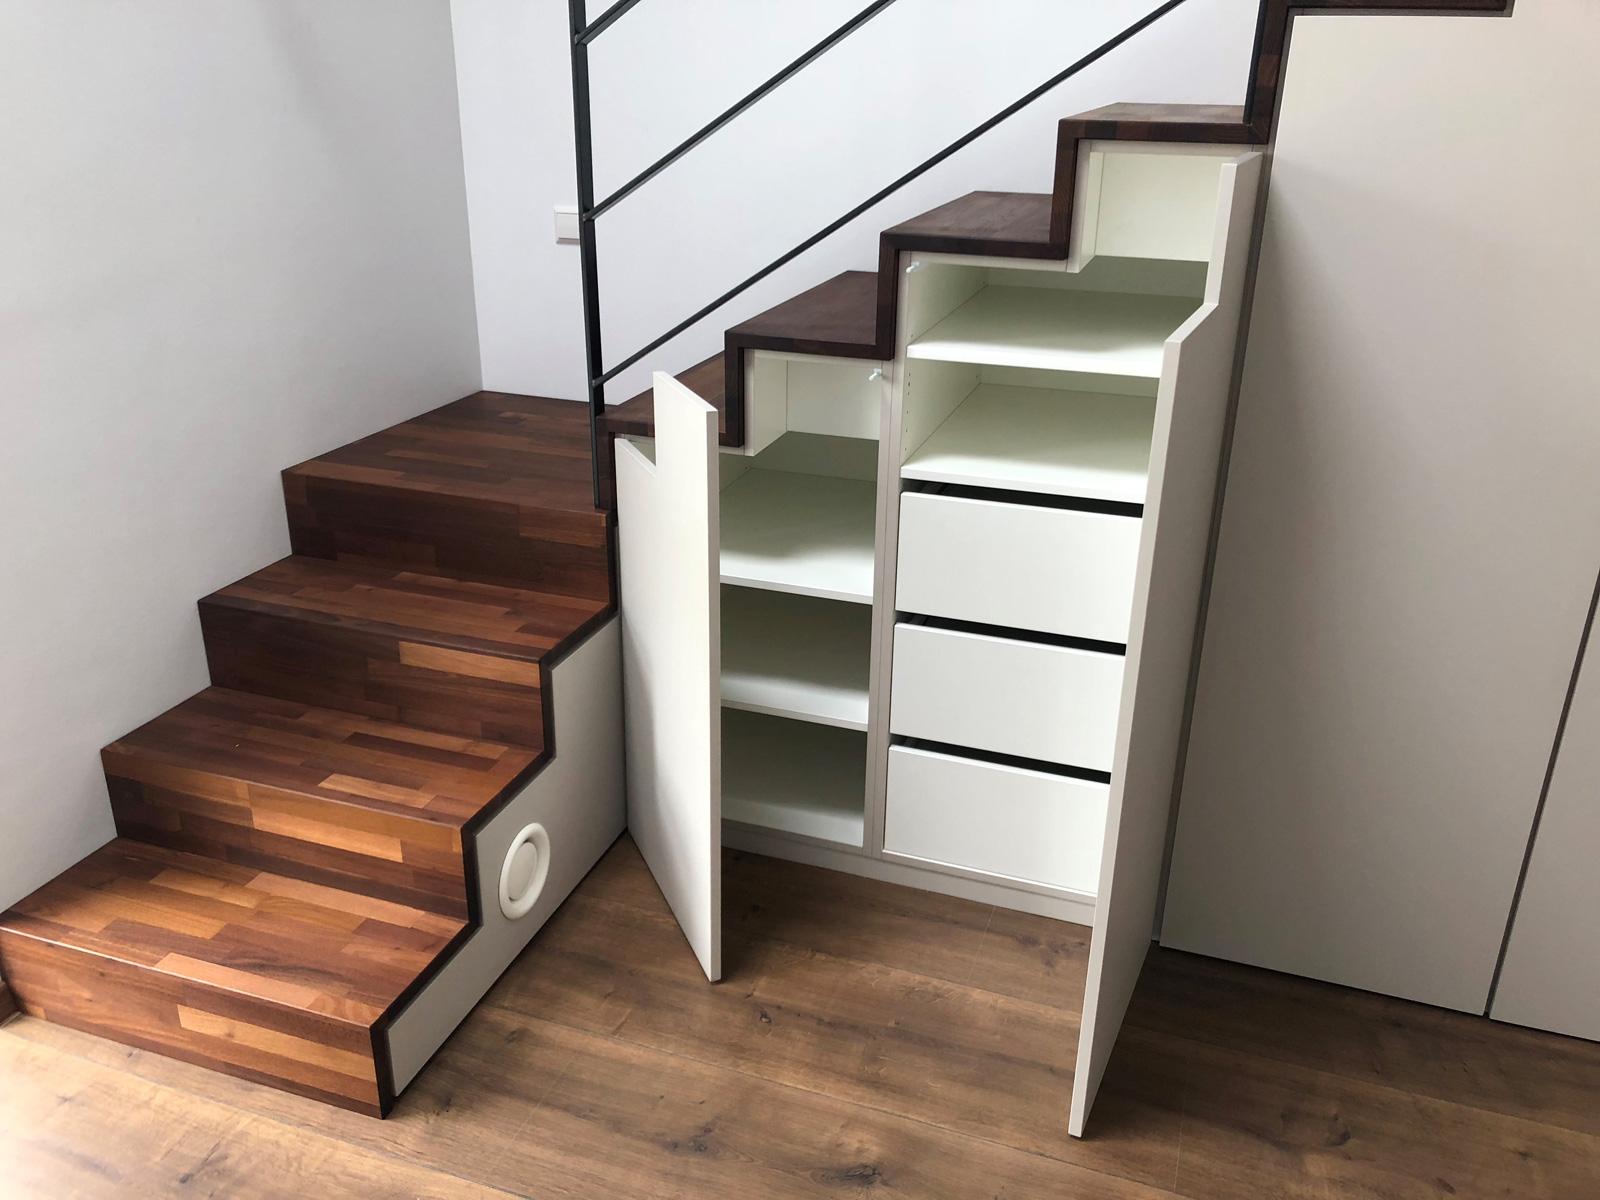 den mobilen handwierker. Black Bedroom Furniture Sets. Home Design Ideas